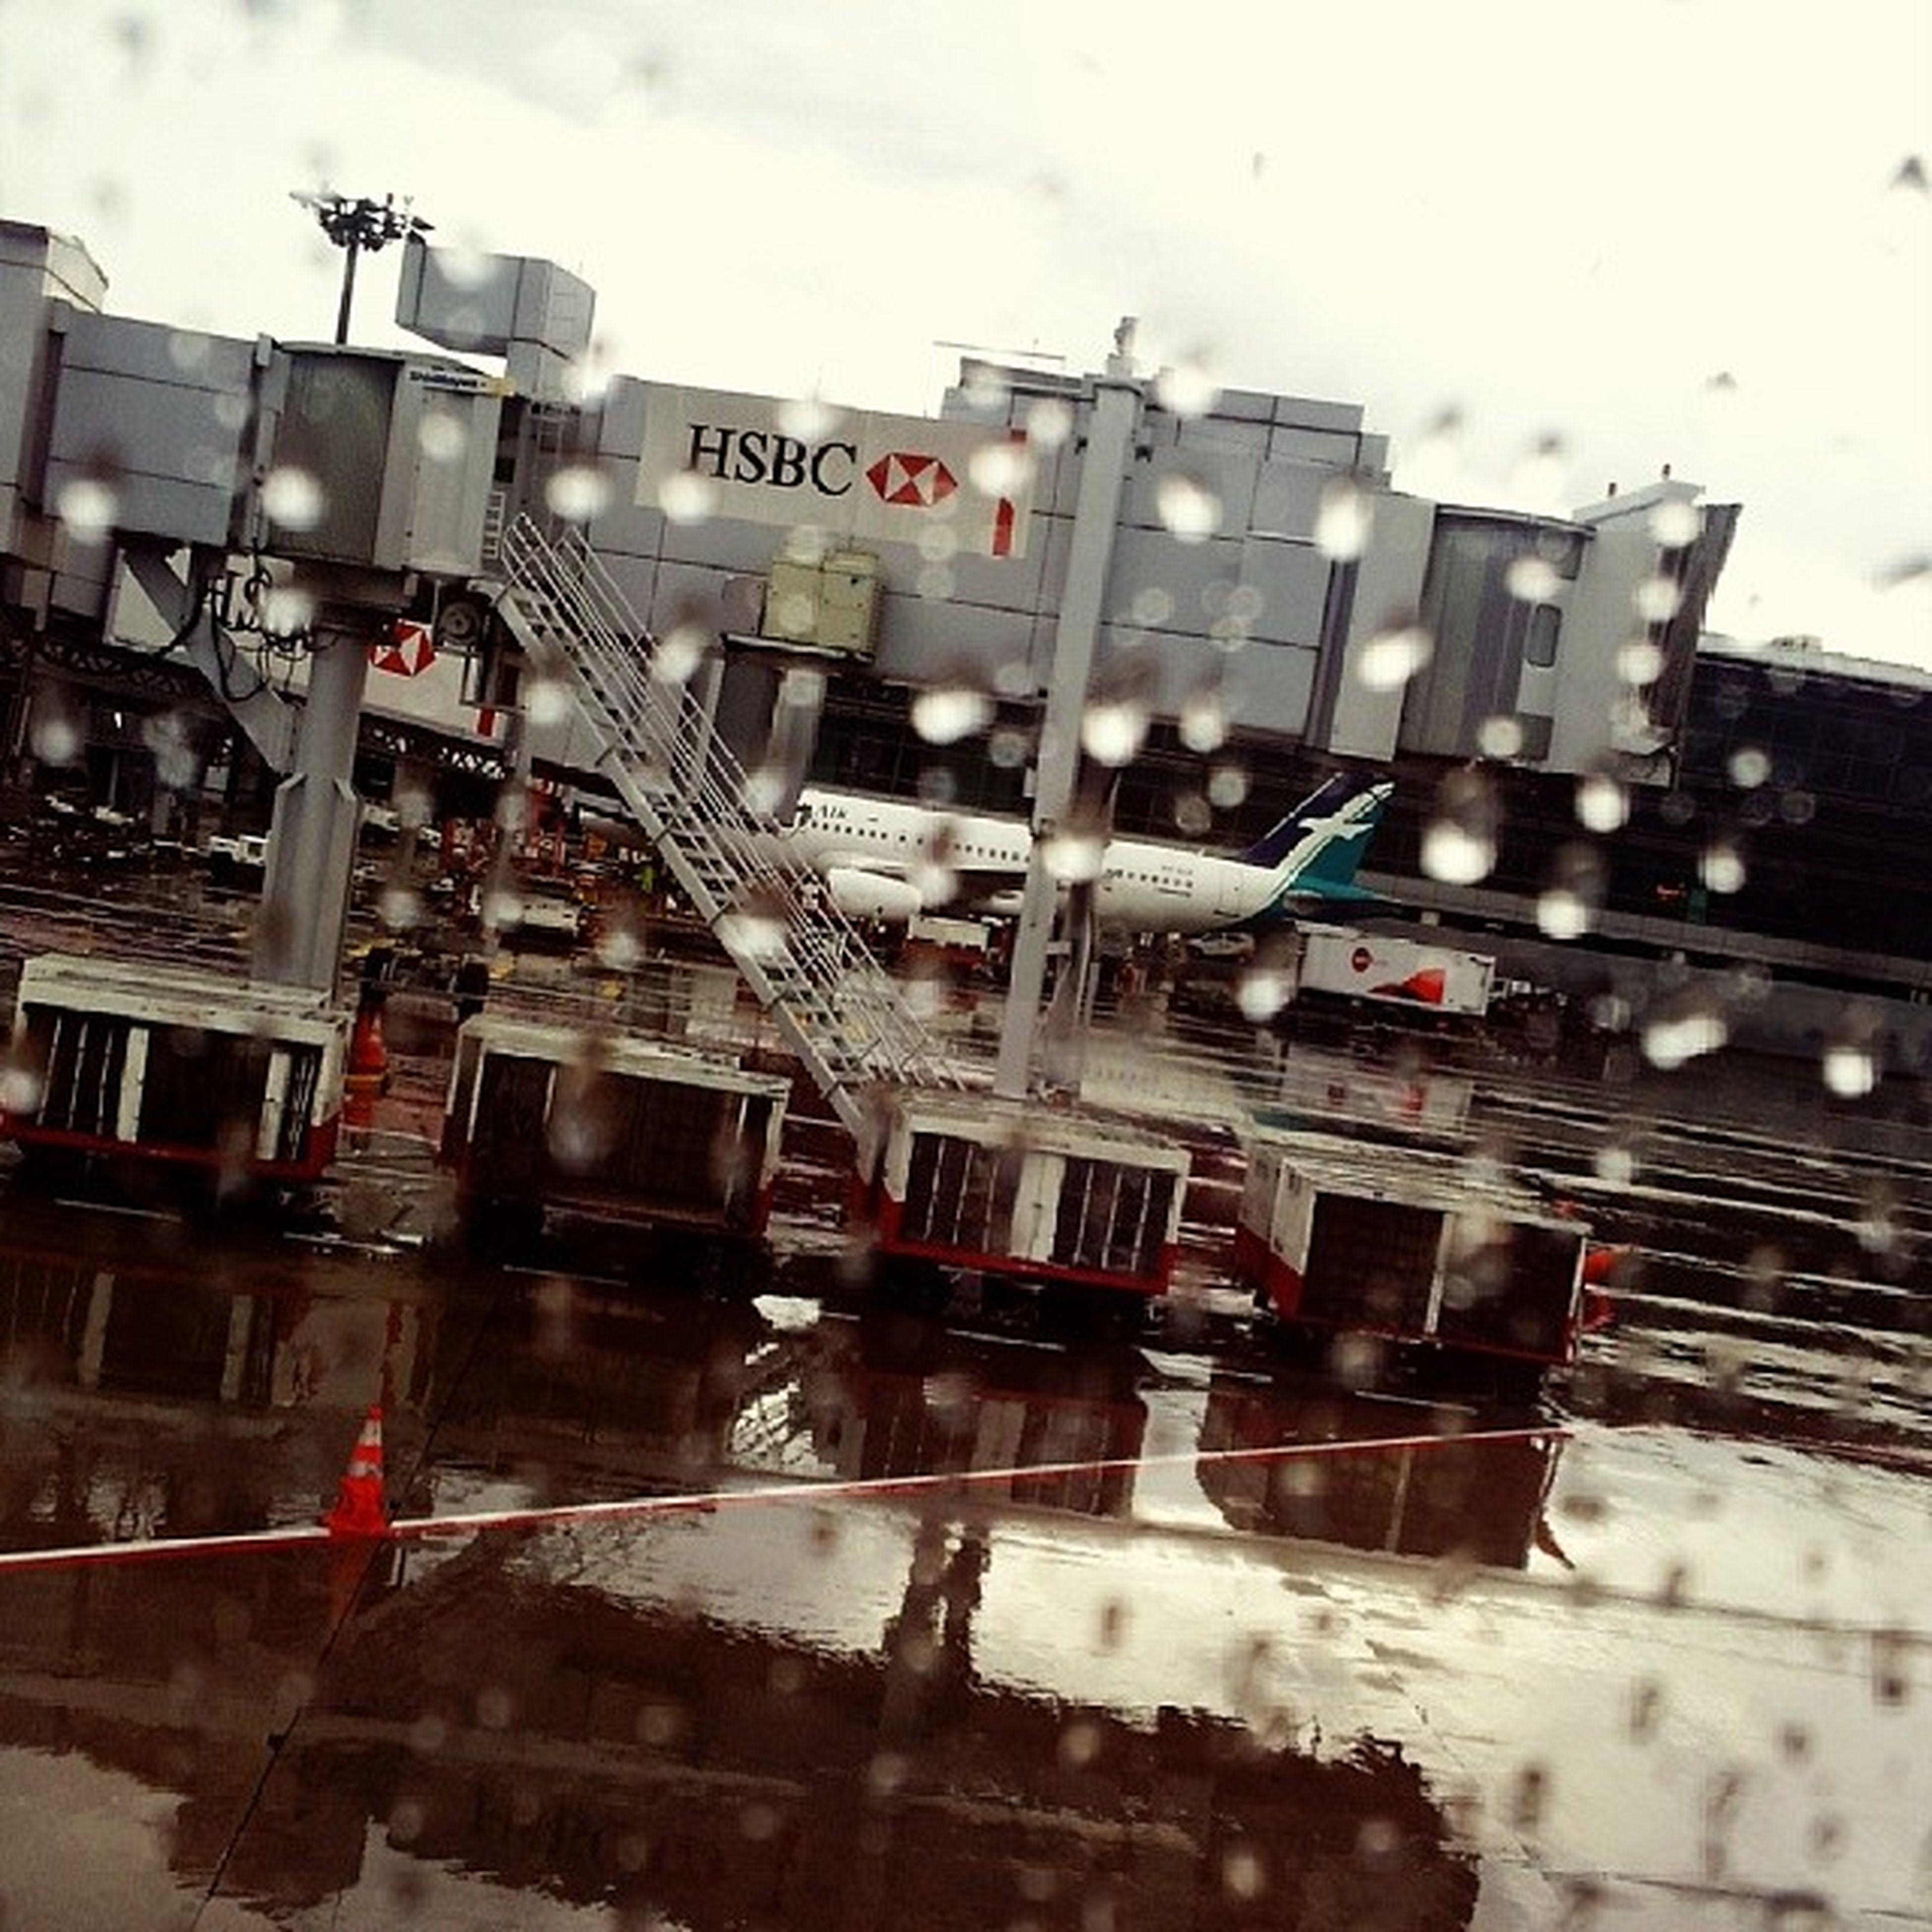 Fly me to Singapore Changiairport Instaplausairport @aplausmagazine